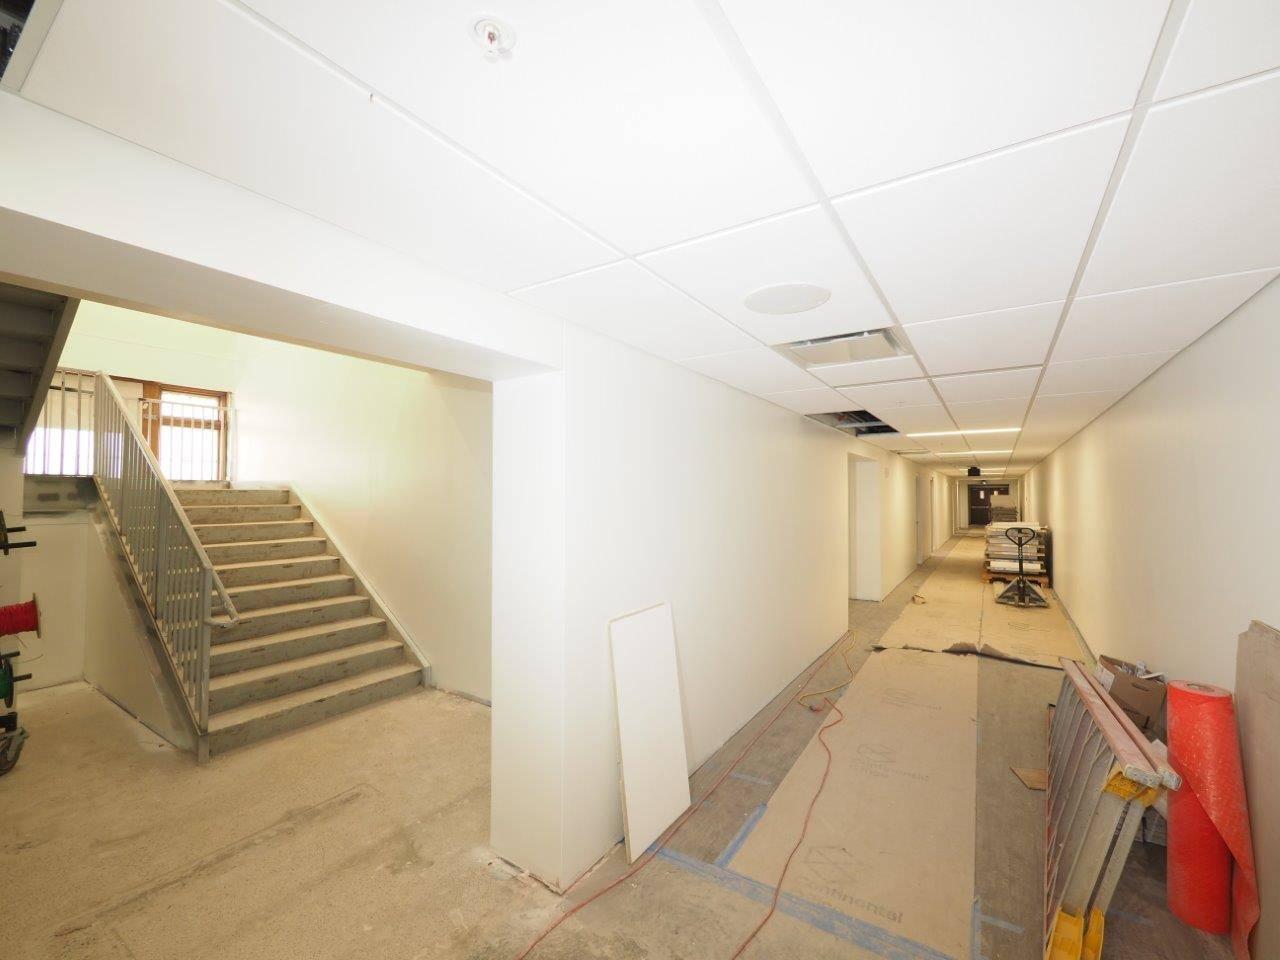 Inside the Barrington Elementary School renovation project